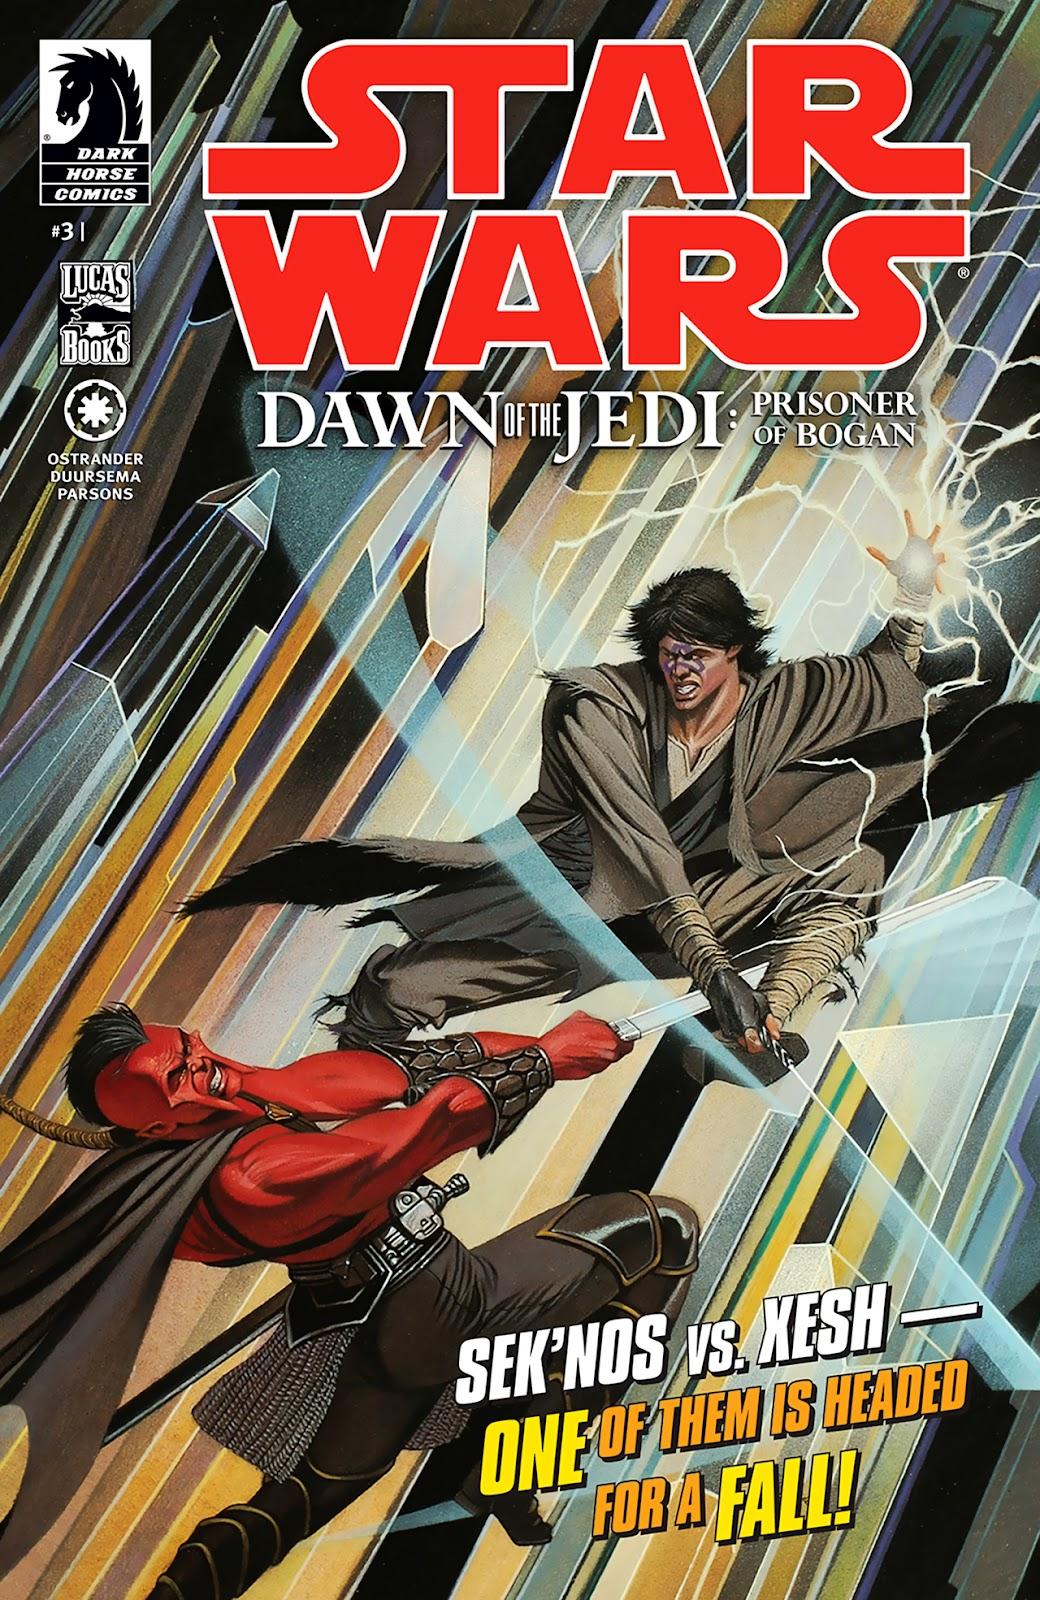 Comic Star Wars Dawn Of The Jedi Prisoner Of Bogan Issue 3